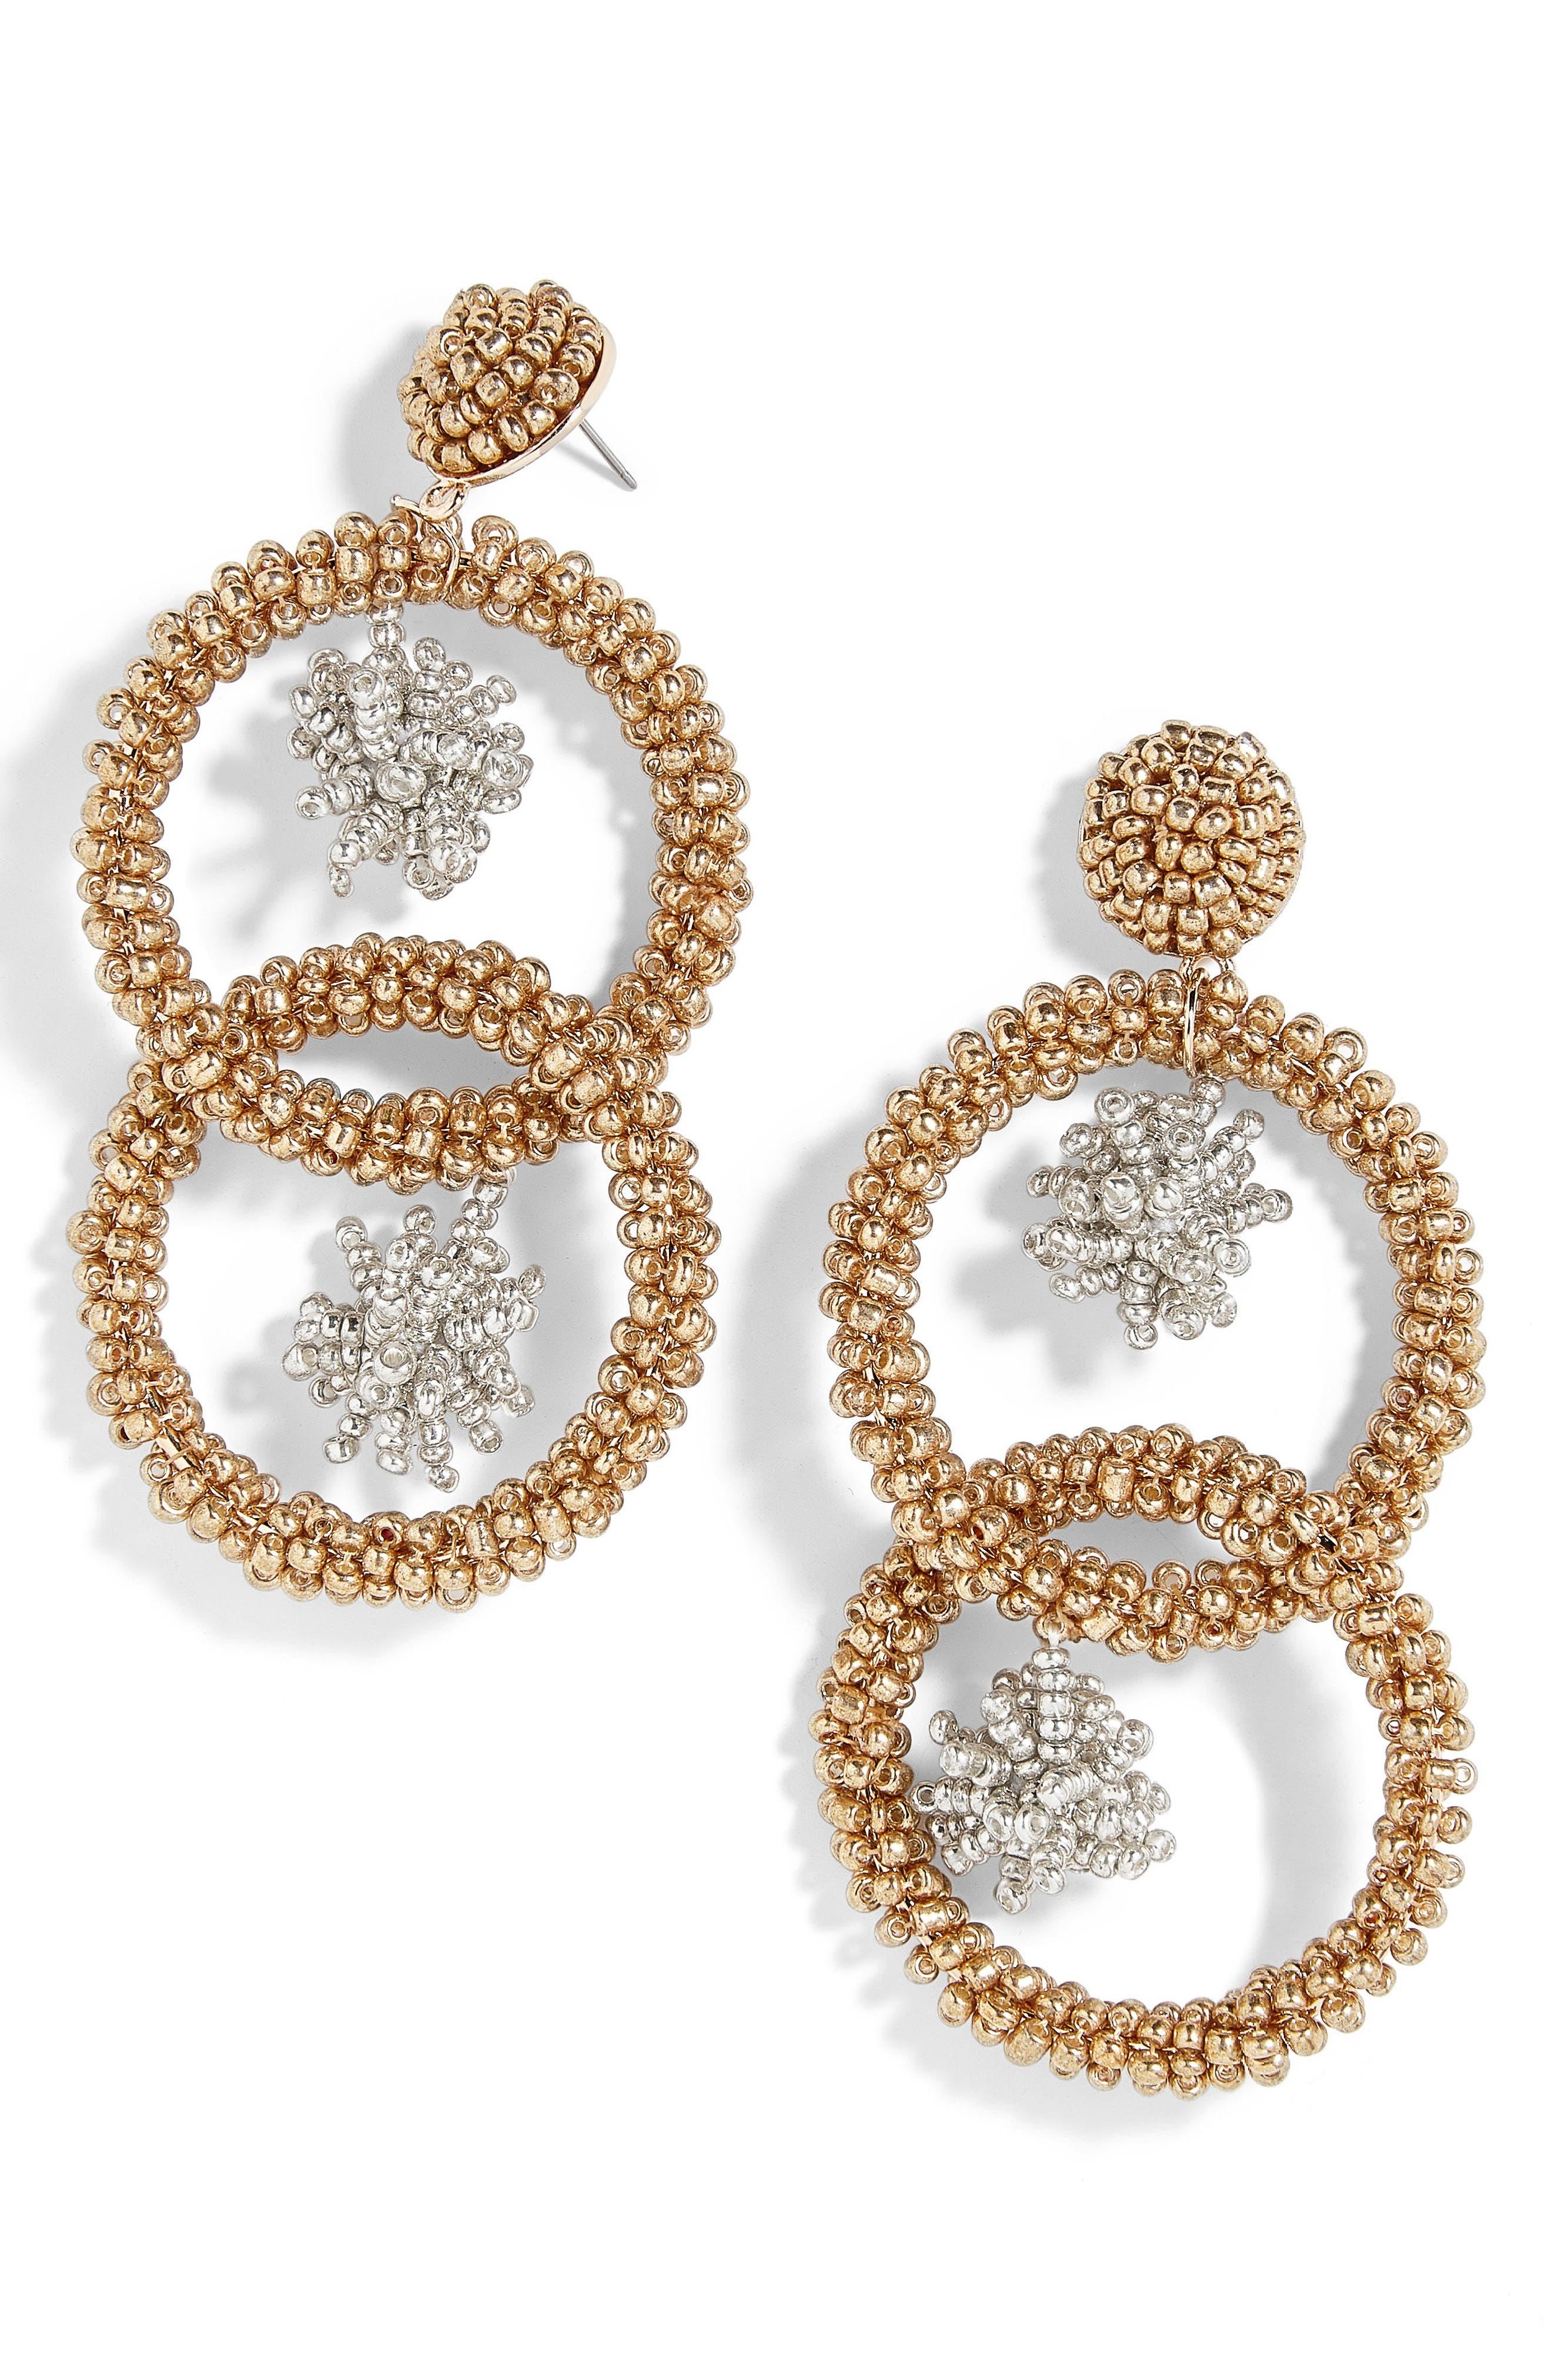 Miyana Beaded Hoop Drop Earrings,                         Main,                         color, Gold